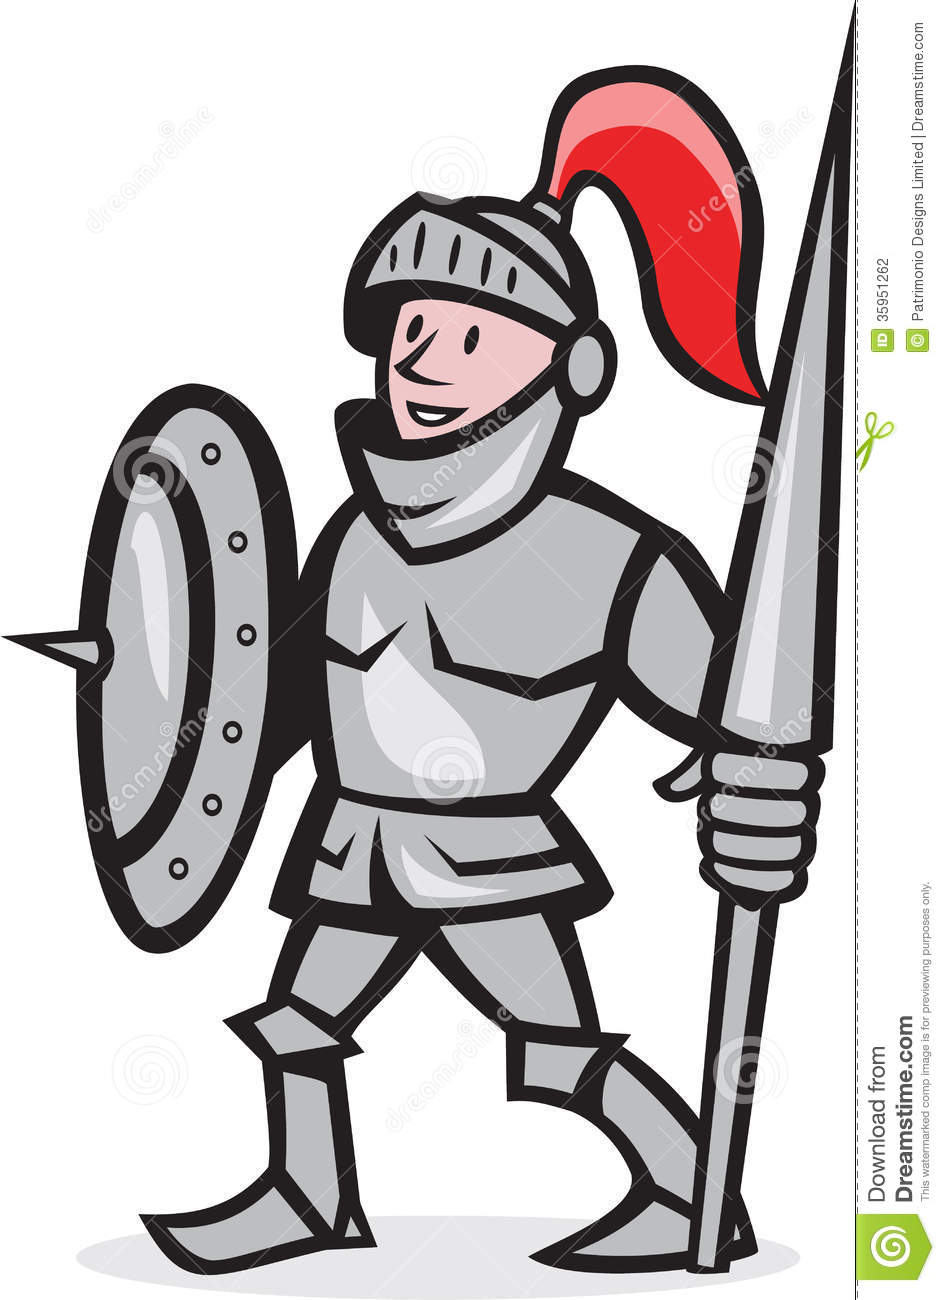 Knight Armor Clipart .-Knight Armor Clipart .-4